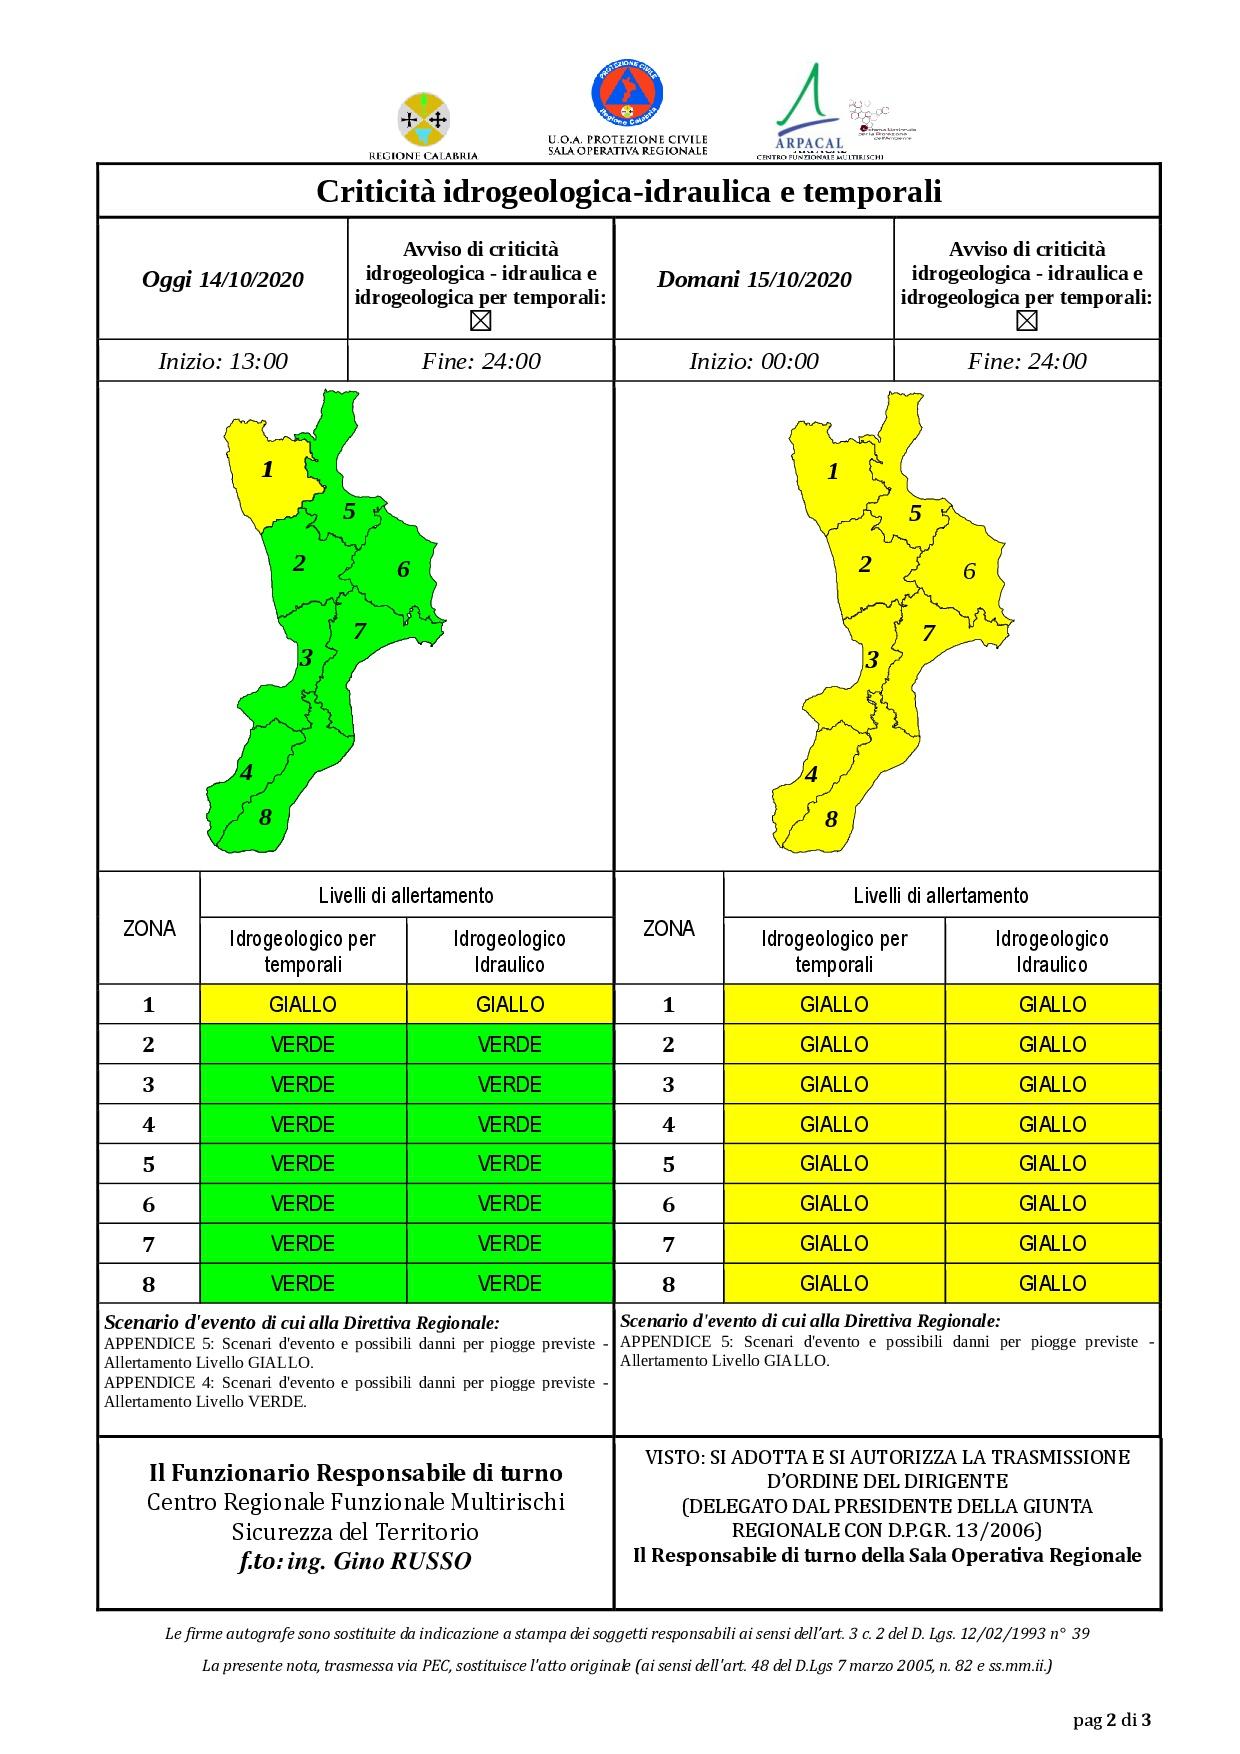 Criticità idrogeologica-idraulica e temporali in Calabria 14-10-2020